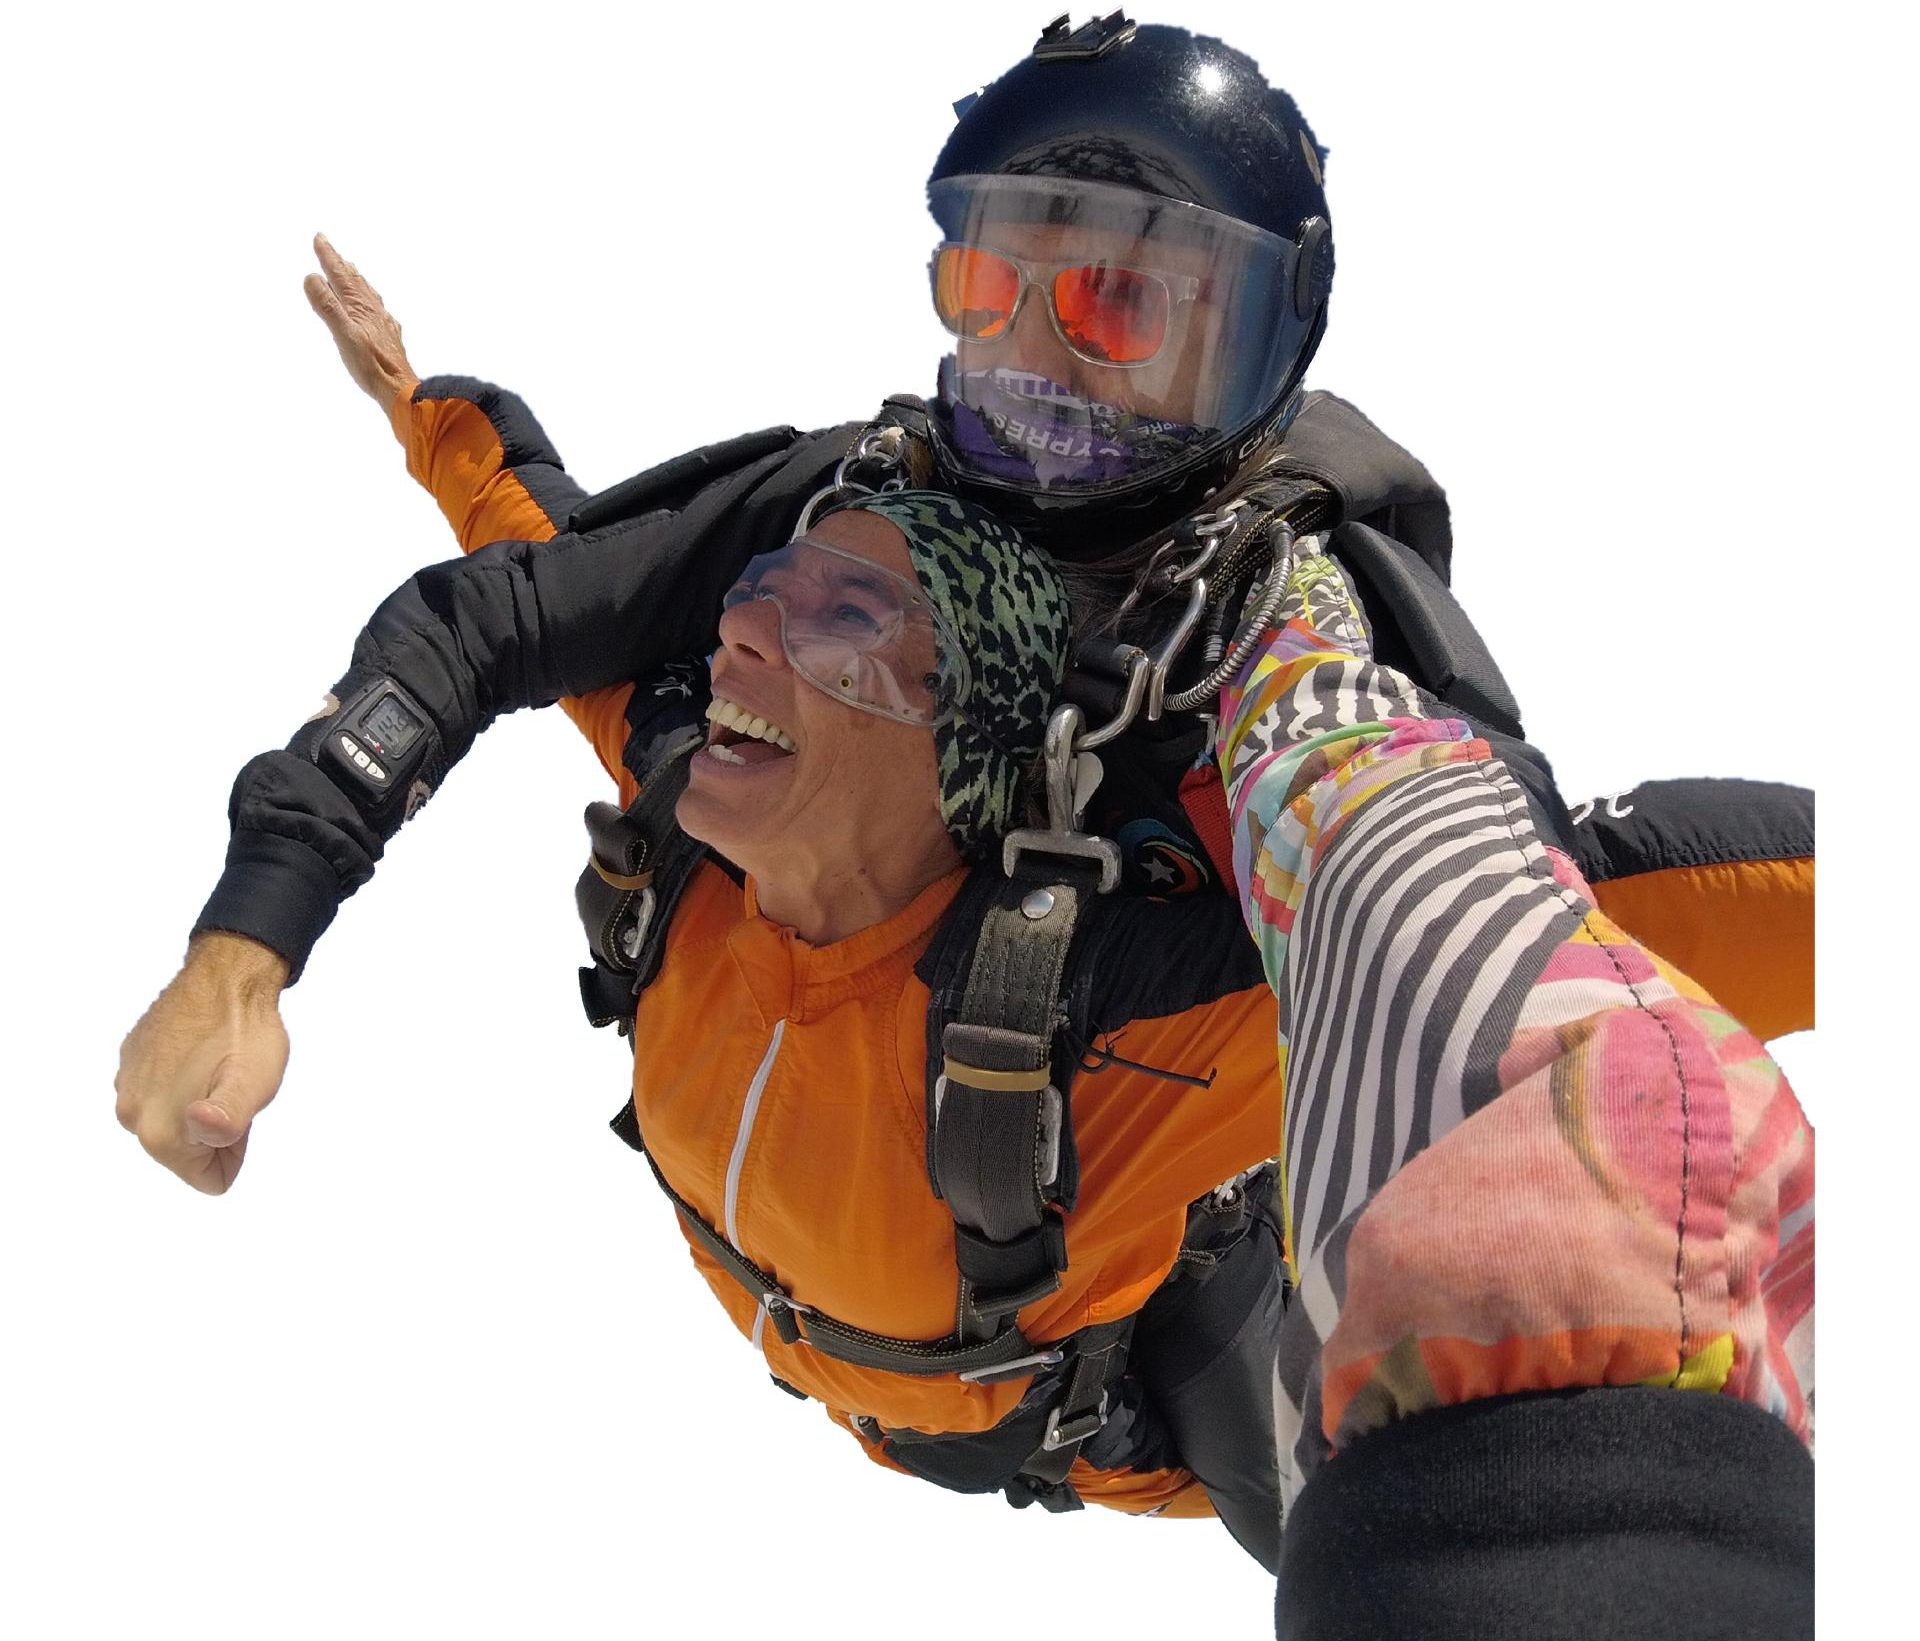 Portugal tandem skydive in Alentejo: Skydiving from 10000ft/3000m